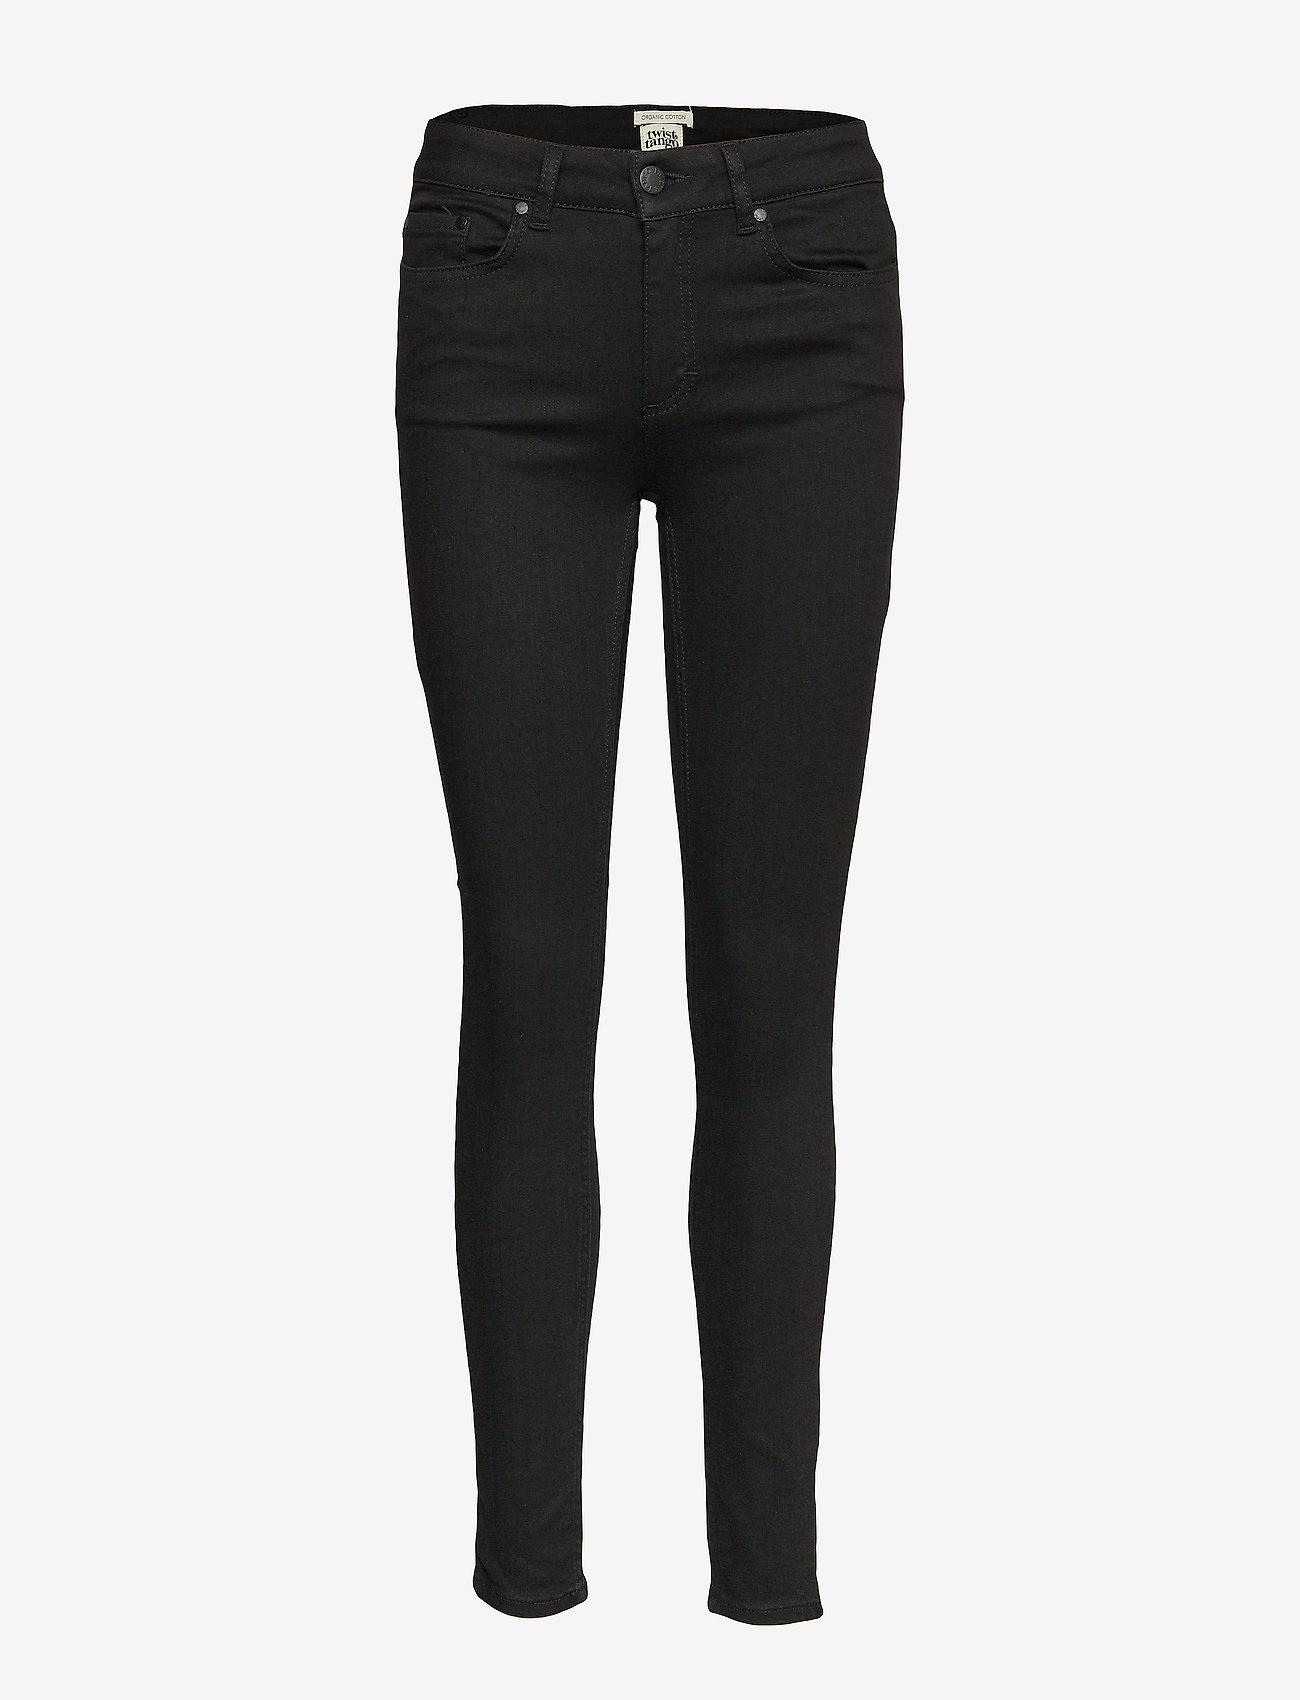 Twist & Tango - Julie Jeans Black - skinny jeans - black - 0